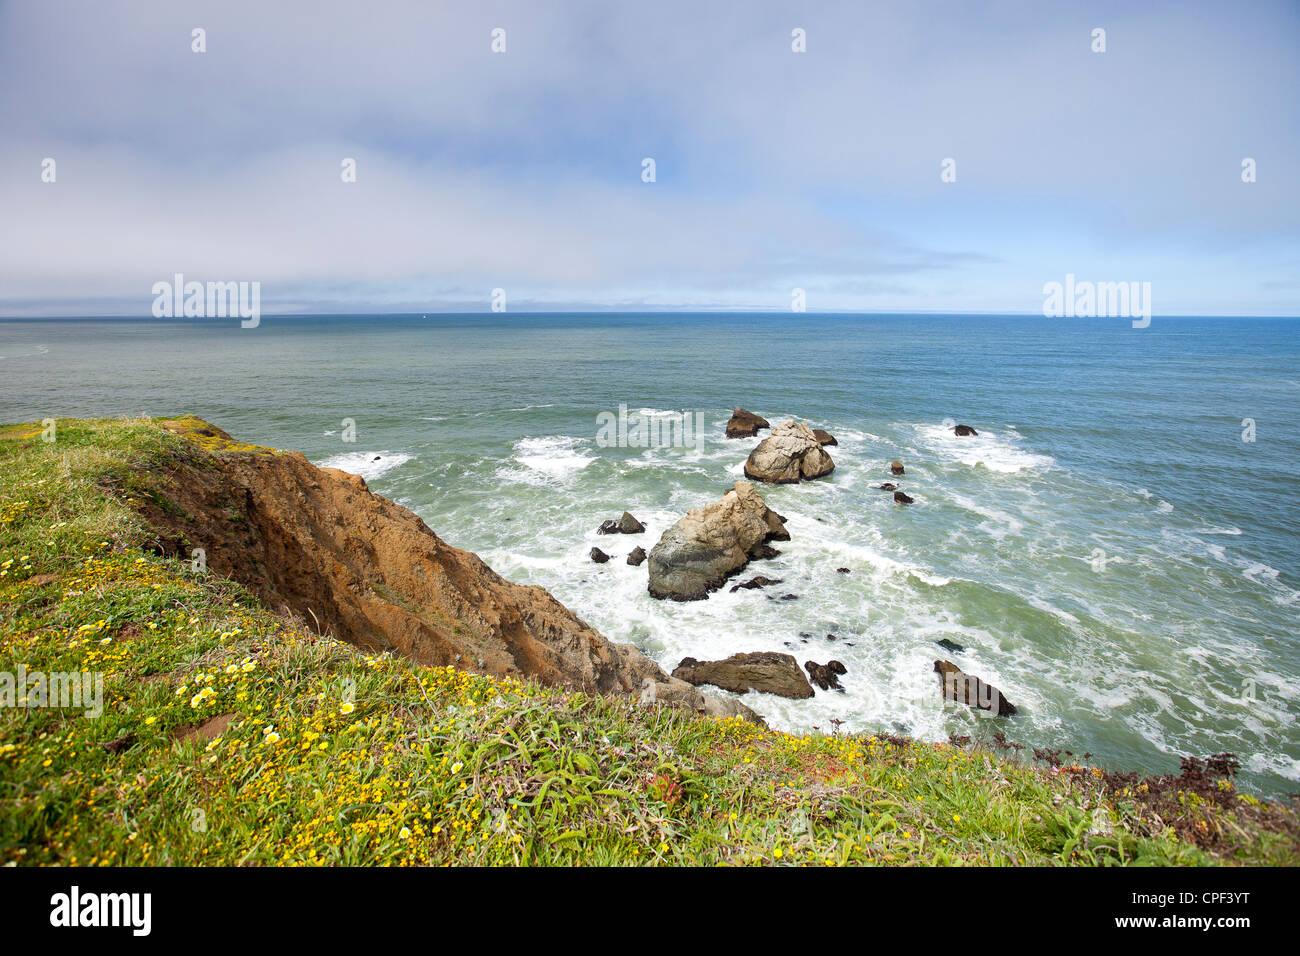 view of ocean - Stock Image